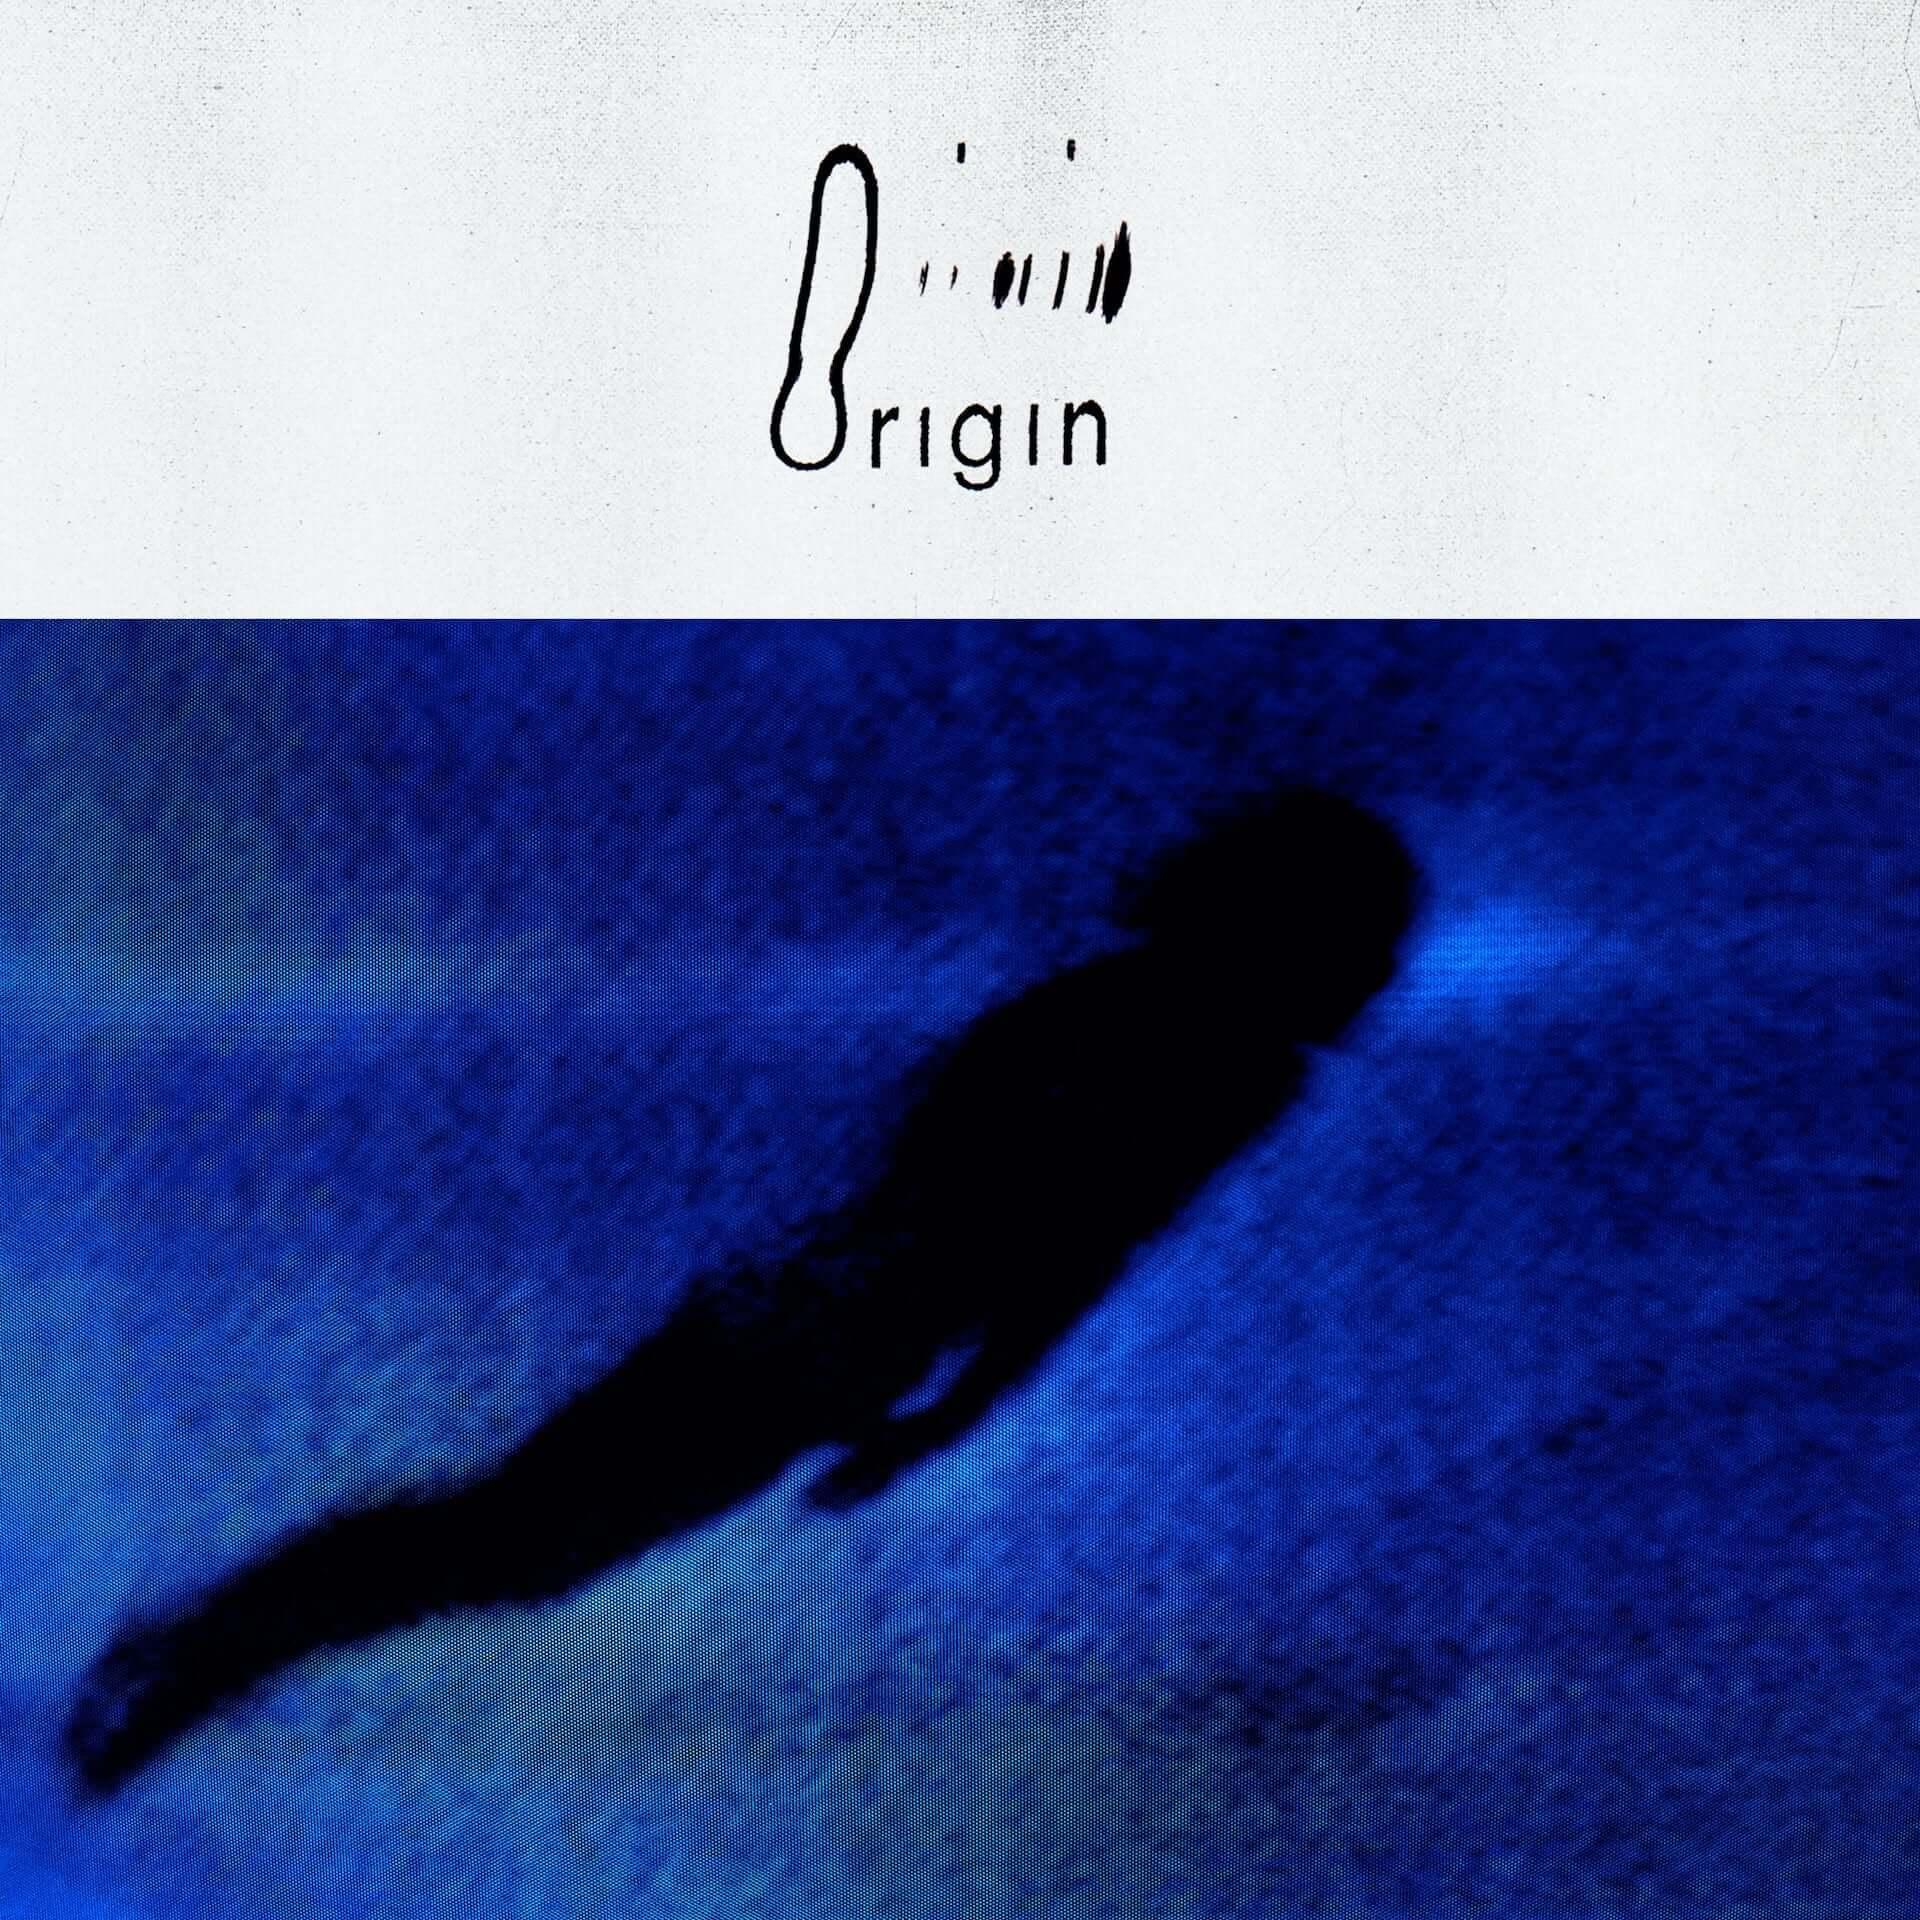 "Jordan RakeiとCommonによる浮遊感抜群のコラボ曲""Signs(feat. Common)""が公開!『Origin (Deluxe Edition)』発売も決定 music200220_jordanrakei_2-1920x1920"